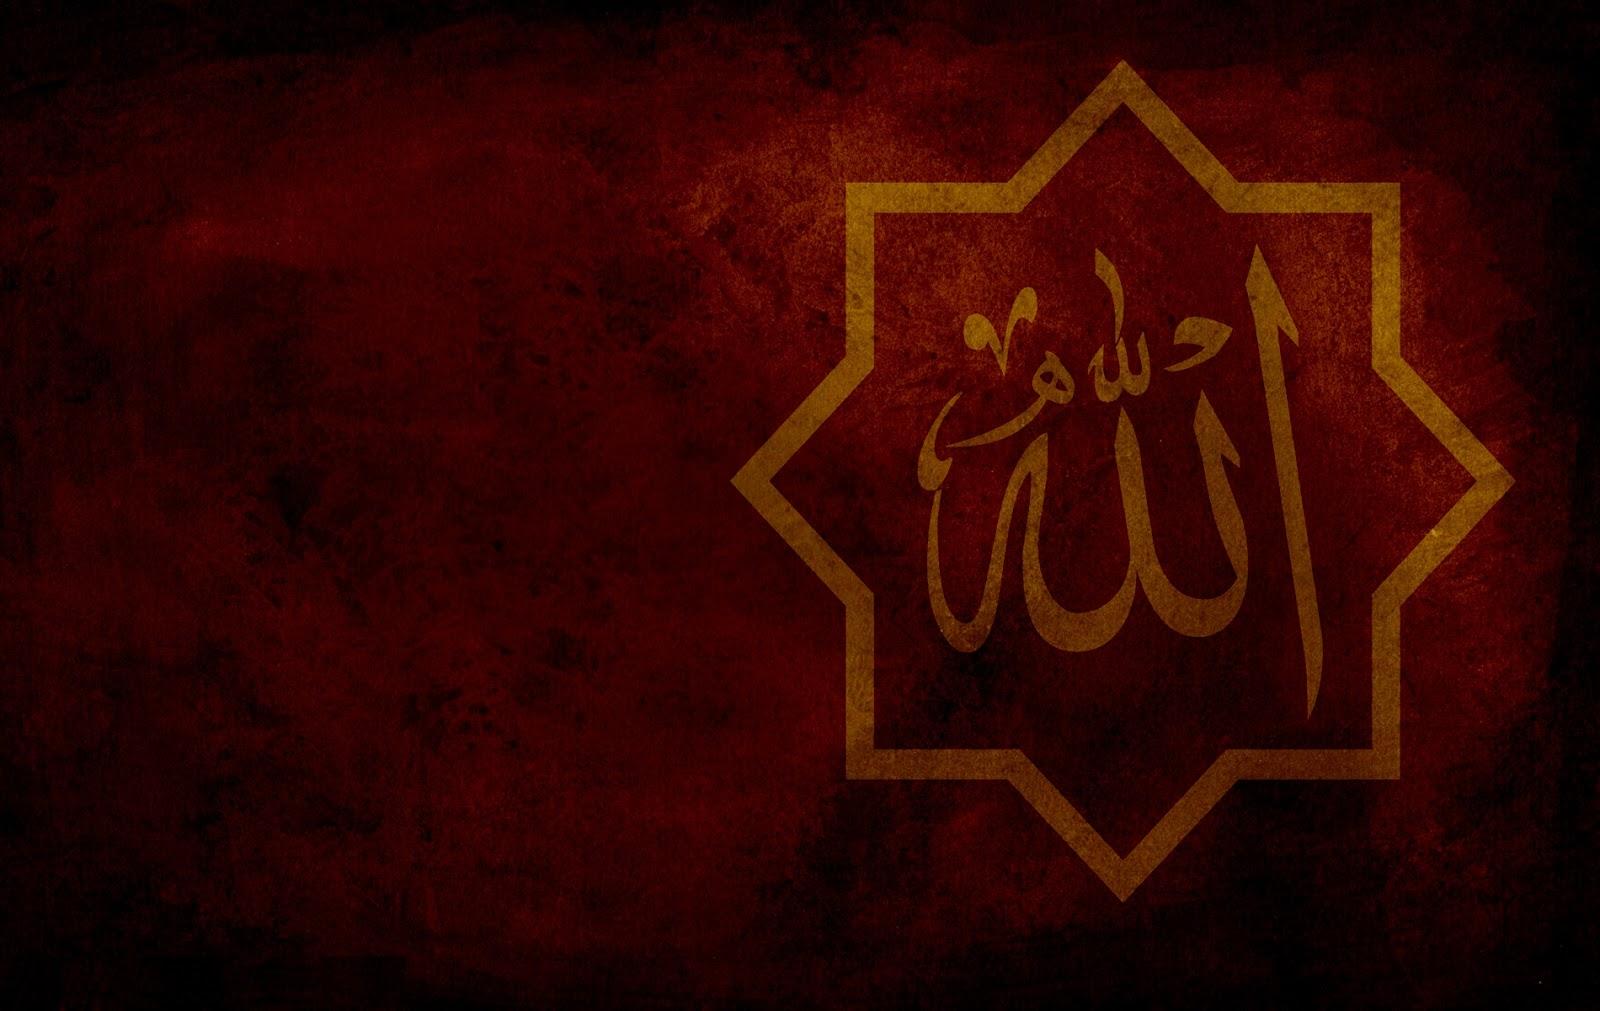 http://3.bp.blogspot.com/-mlLLZkoiTZo/UQEP1O7_IqI/AAAAAAAADrA/v8LO-xJSYxQ/s1600/Lord+Allah+HD+Wallpapers+1.jpg